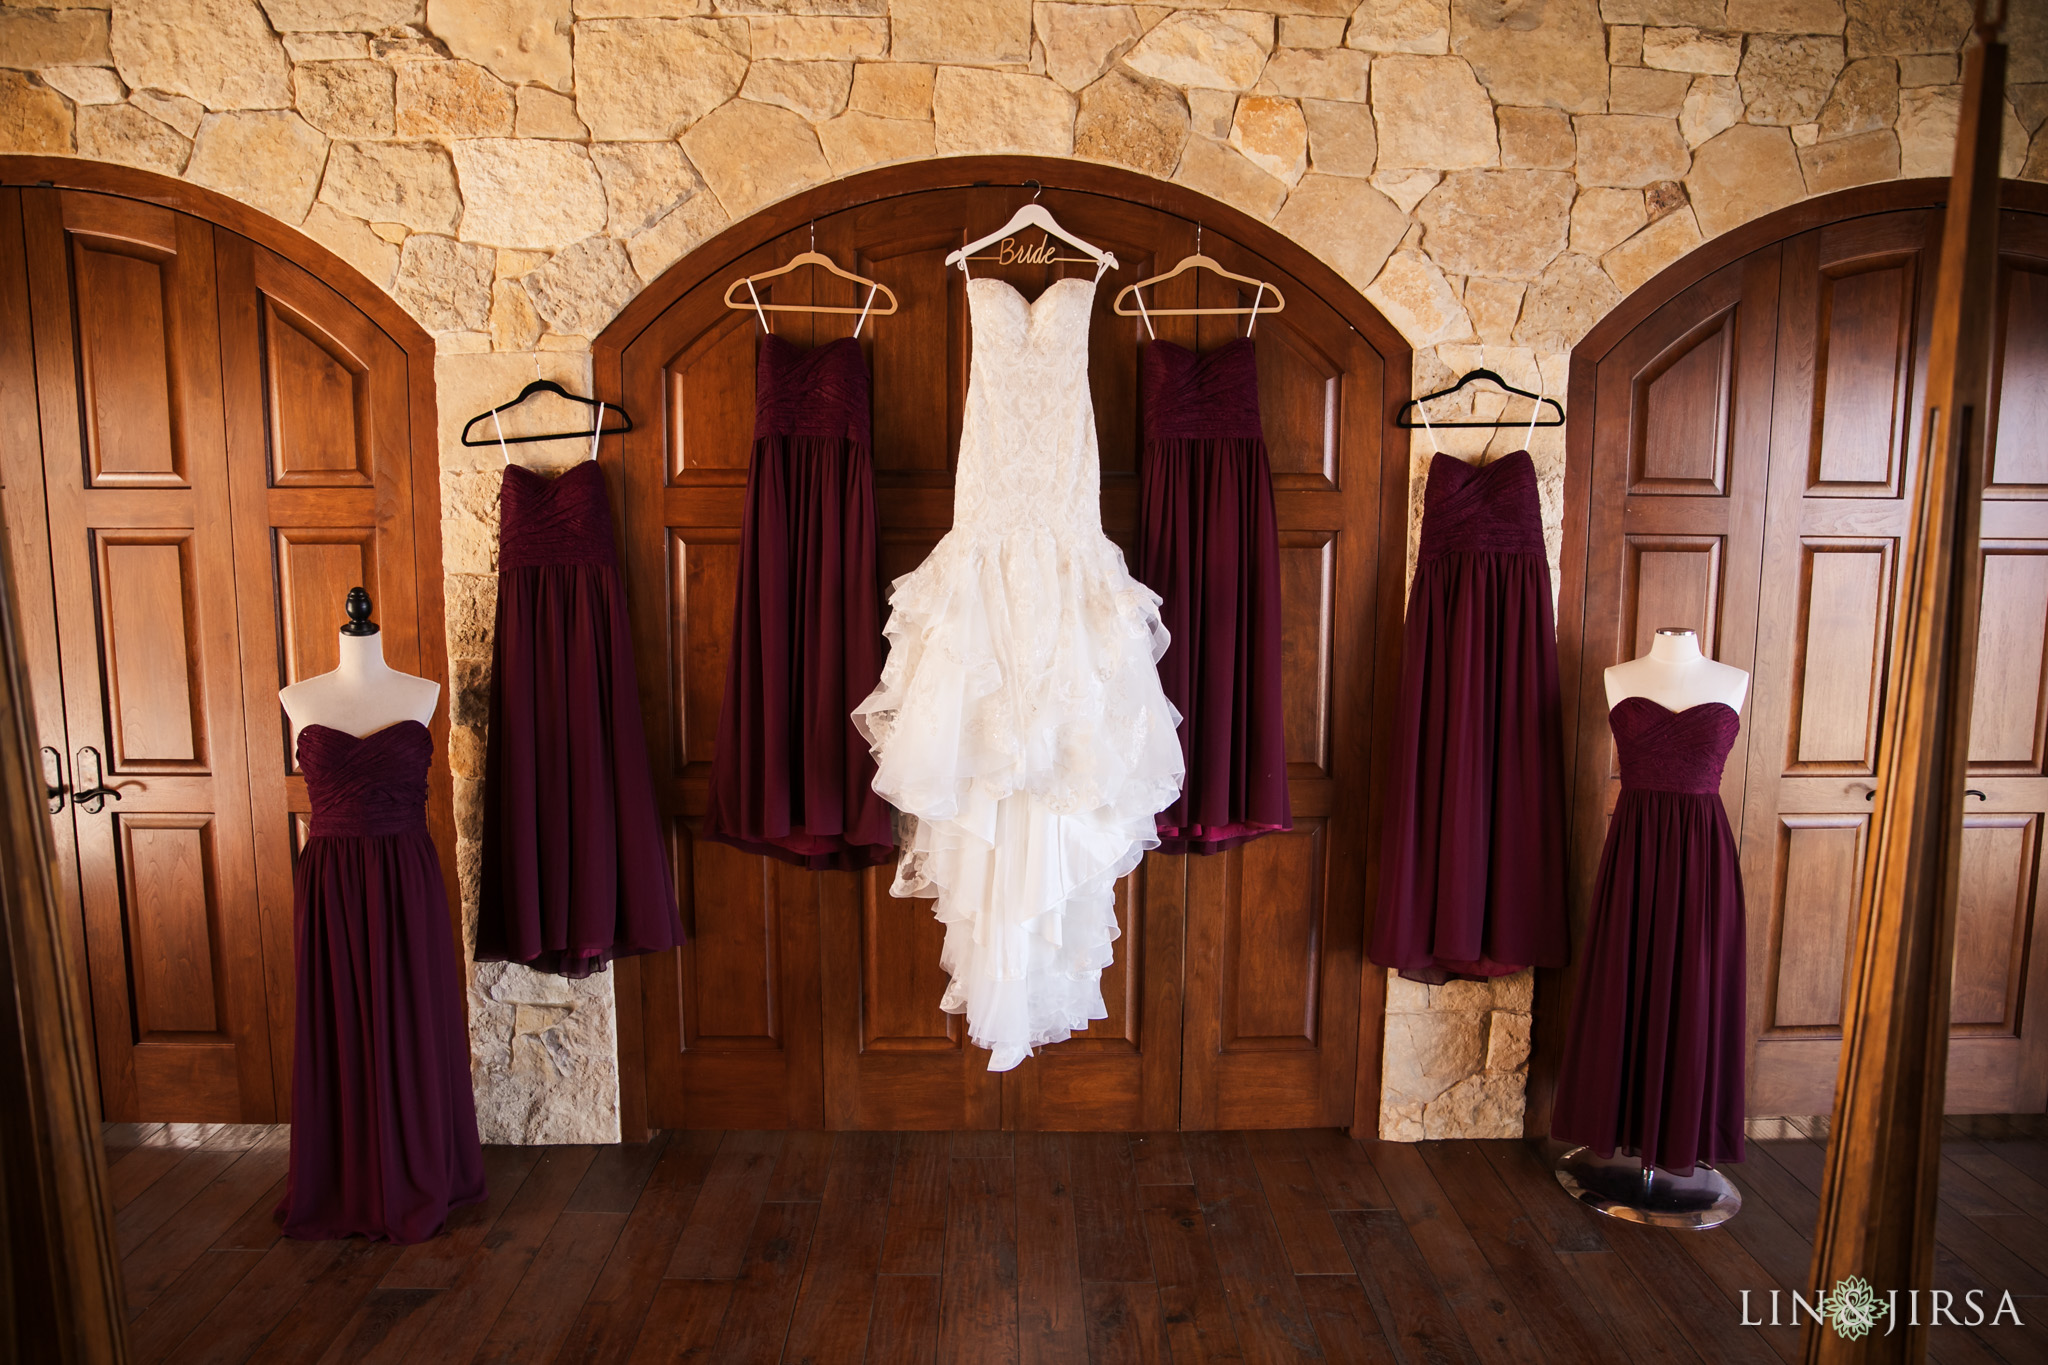 zja malibu rocky oaks wedding photography